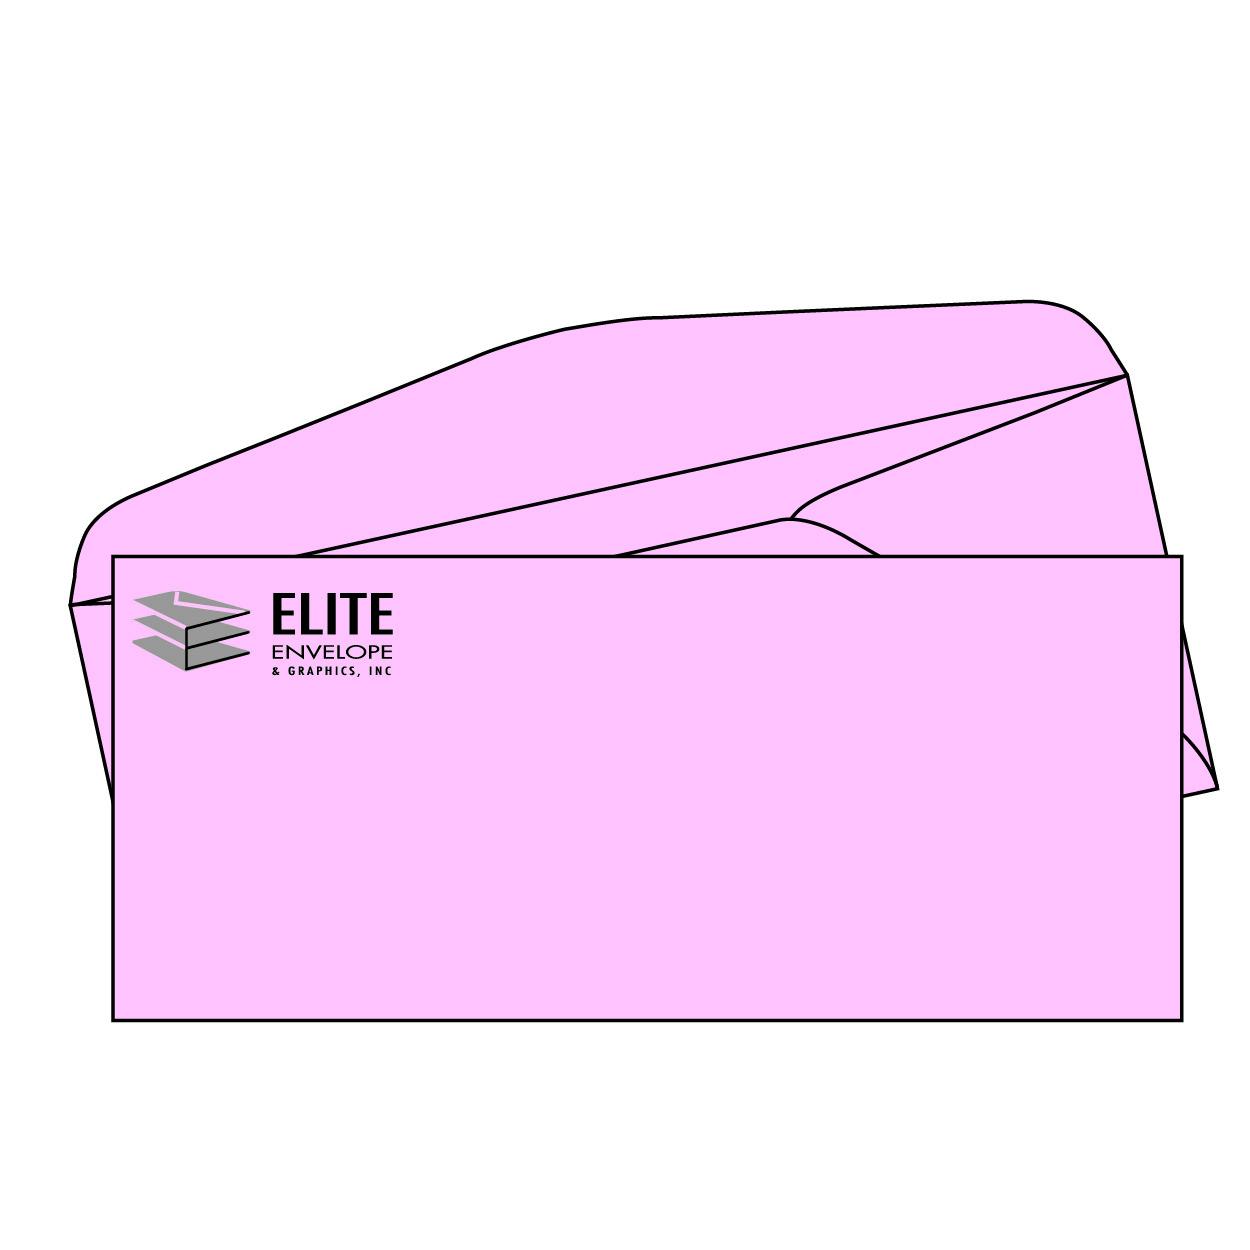 Item AB10 - #10 Regular Envelope - Colored Paper